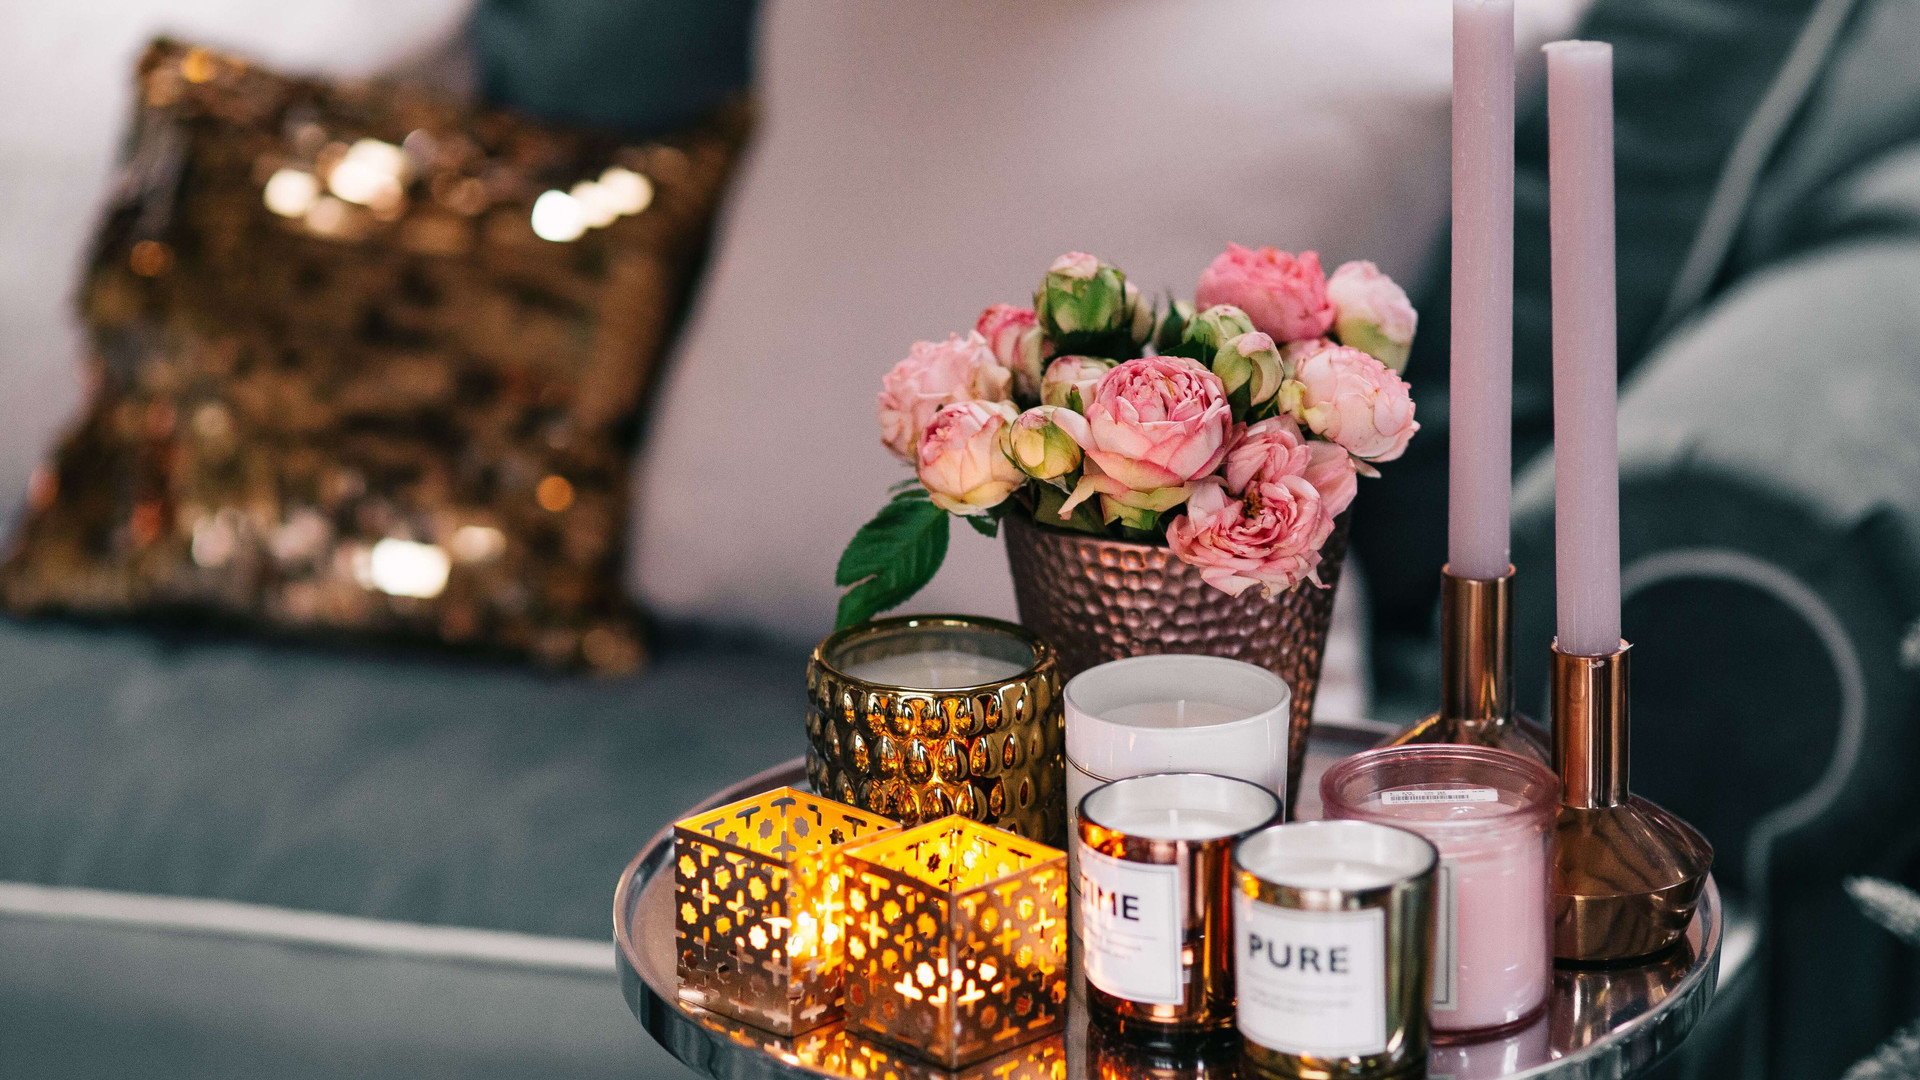 kaboompics_Pink Flowers & Decorations.jp